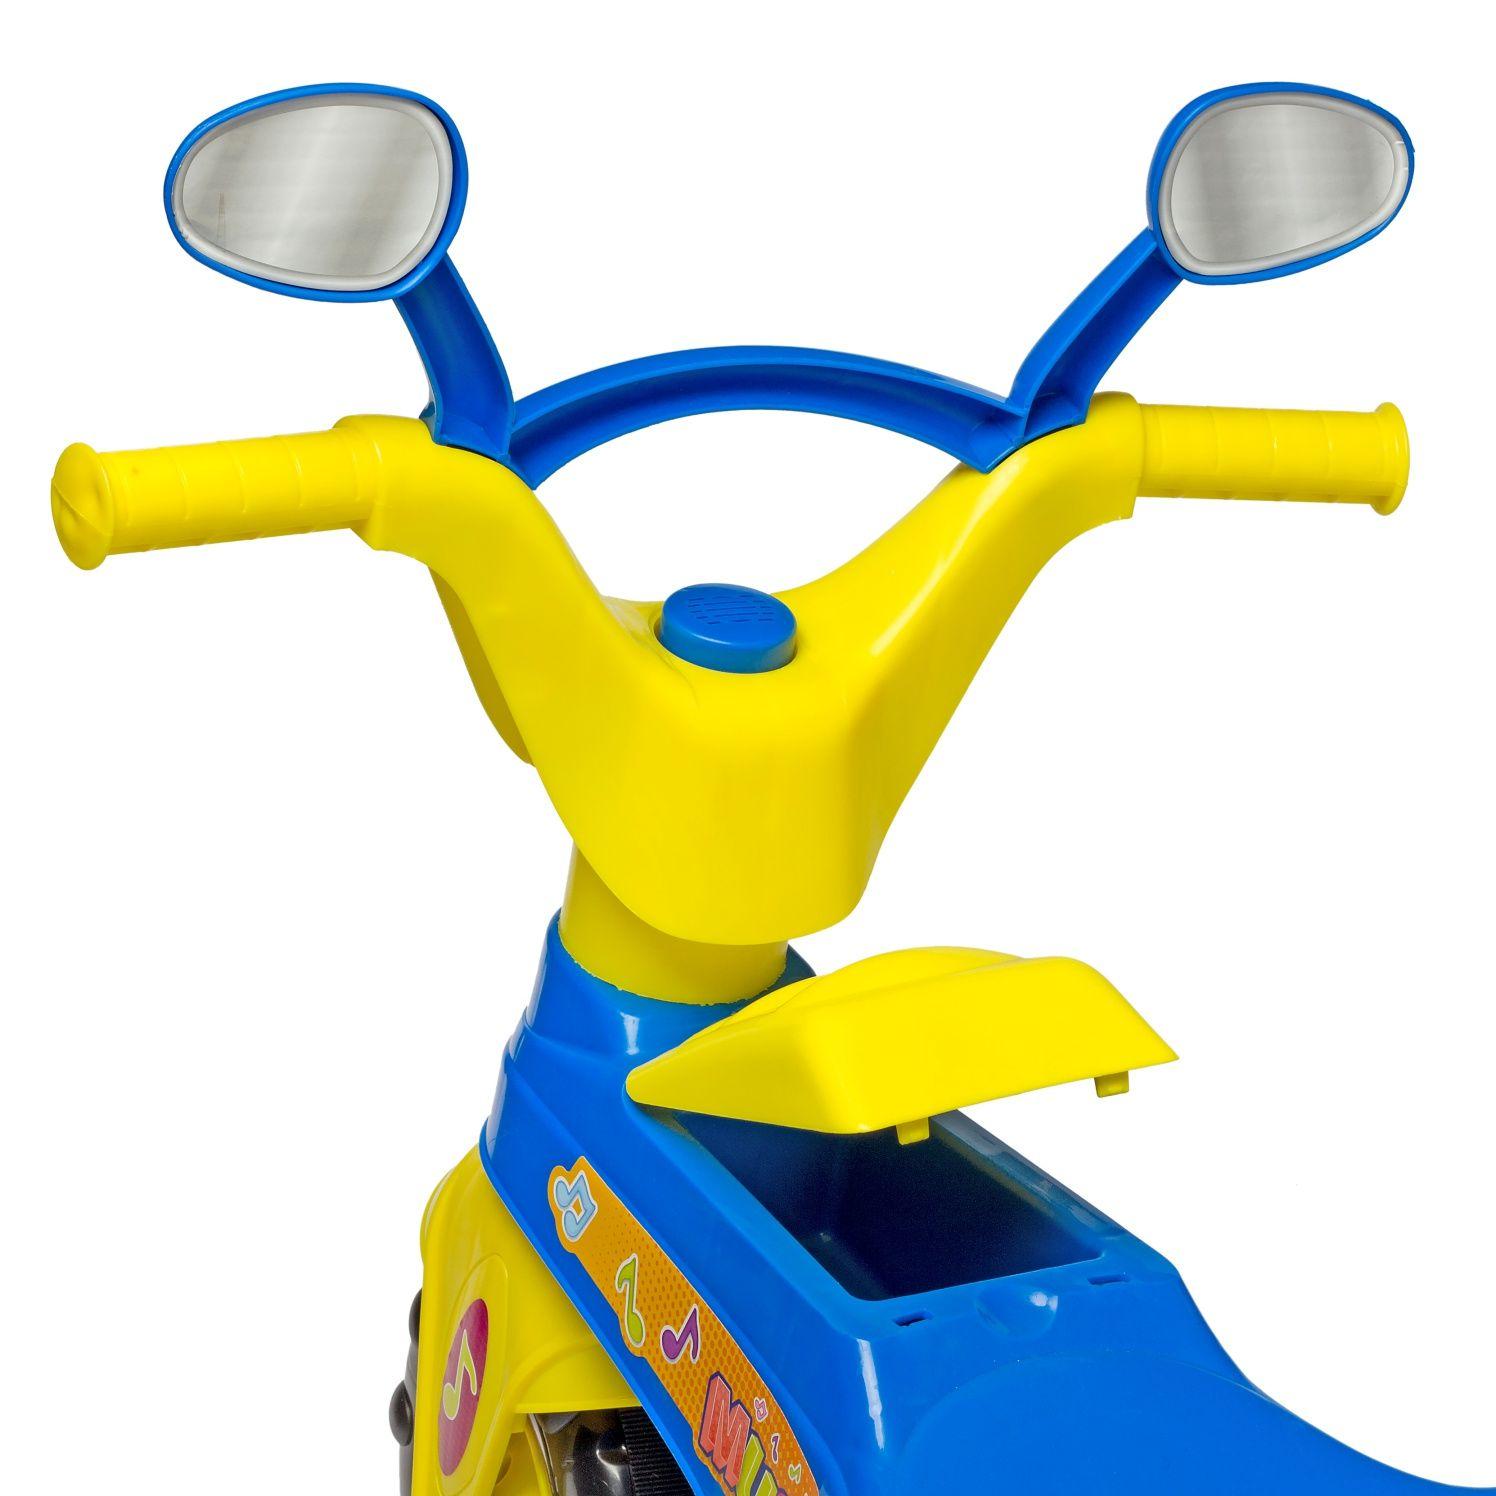 Triciclo Infantil Blue Music com Haste - Cotiplás